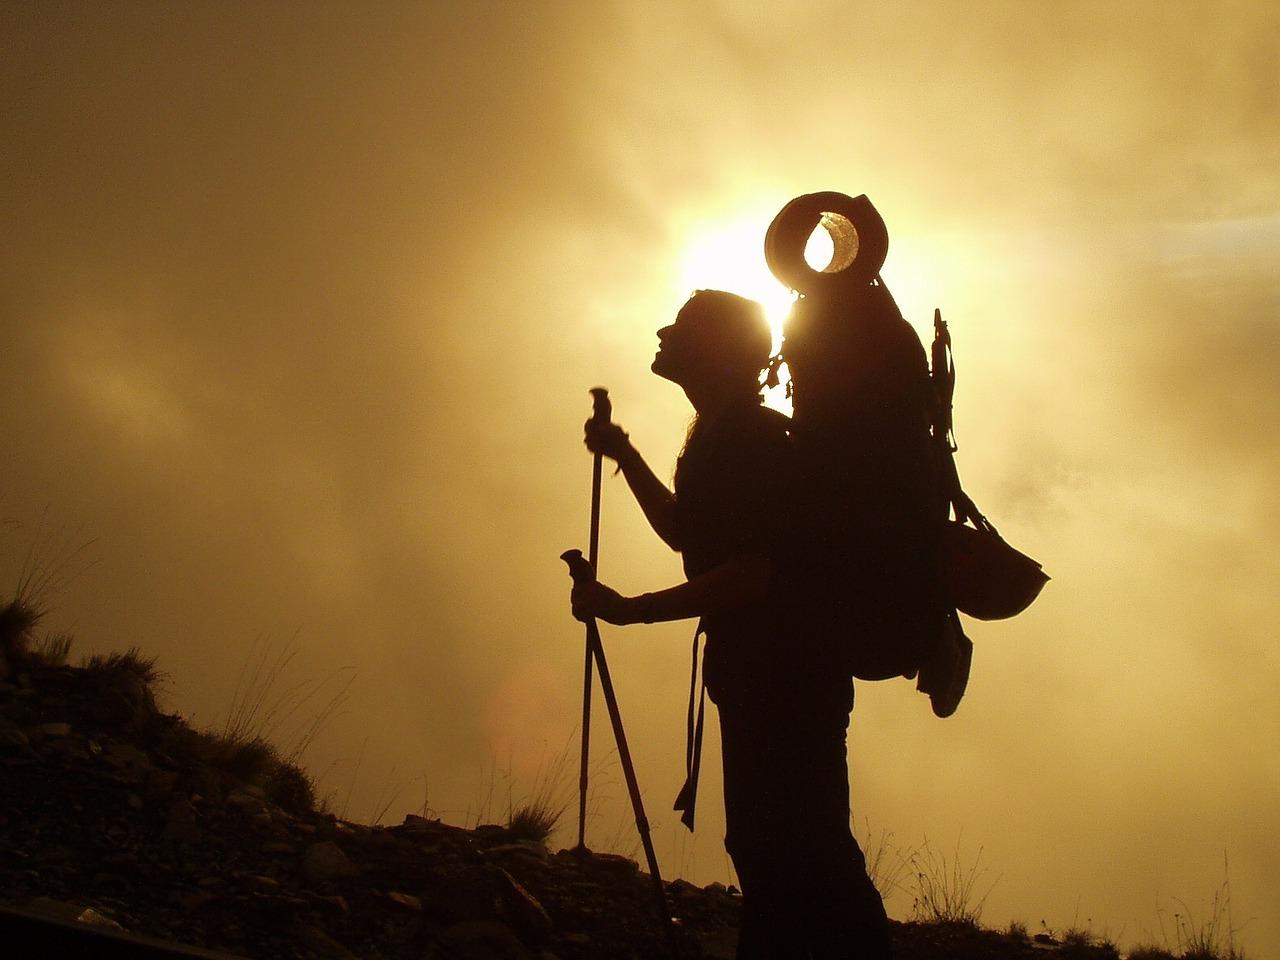 trekking-245311_1280 Tour du Mont Blanc